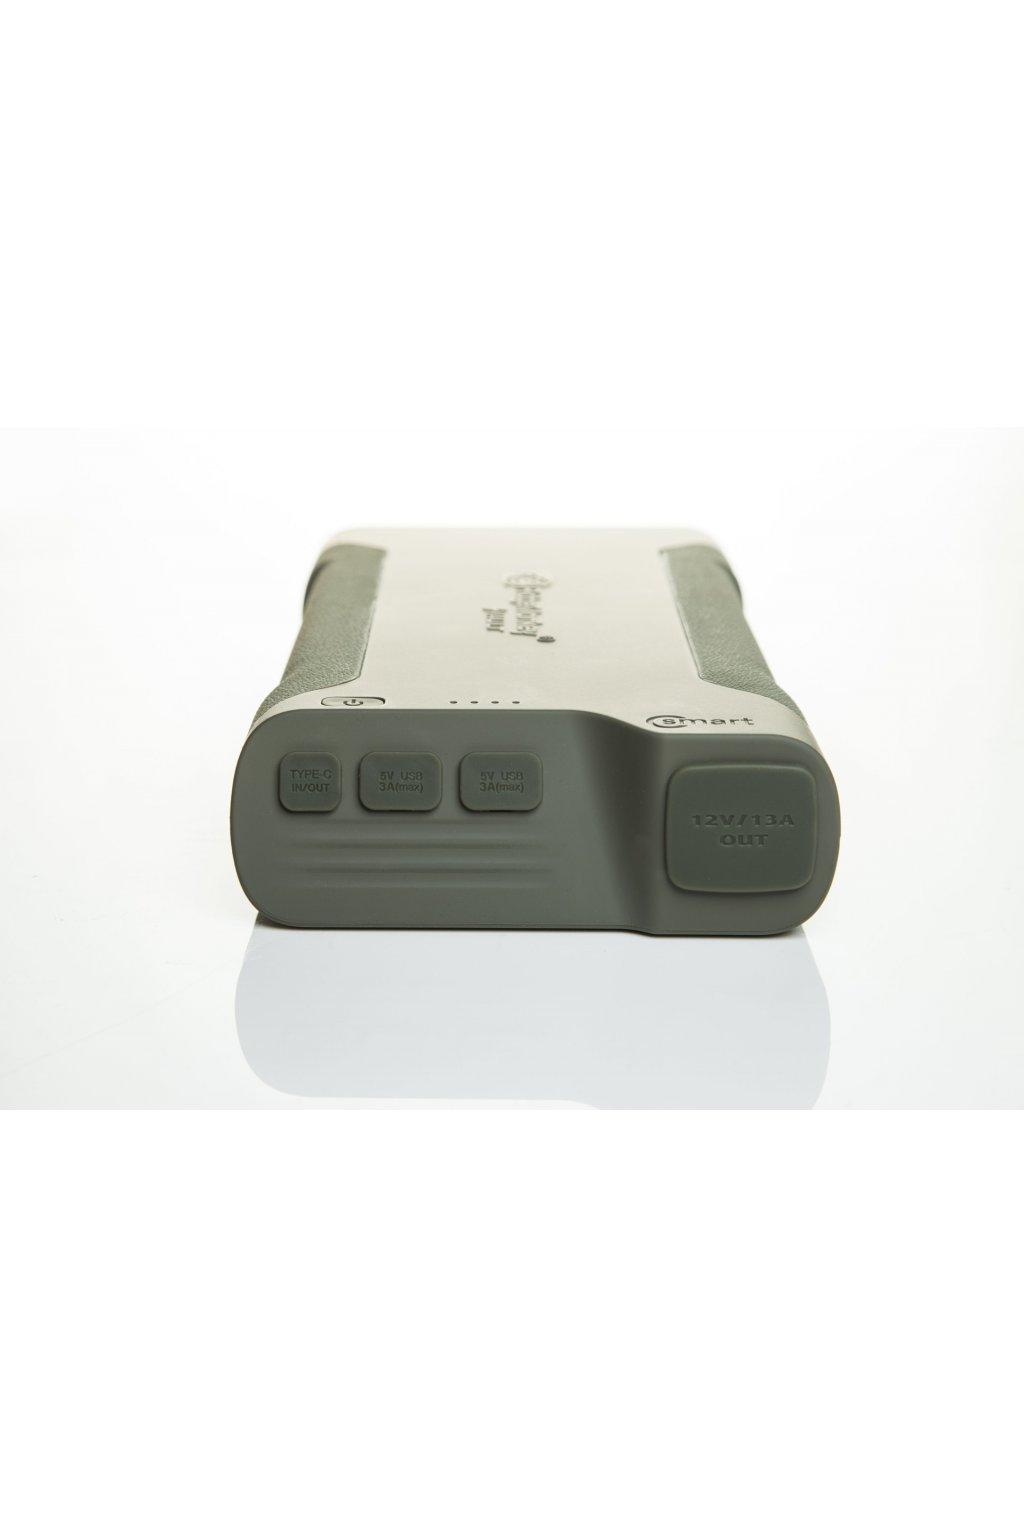 RidgeMonkey: Powerbanka Vault C-Smart 77850mAh Zelená